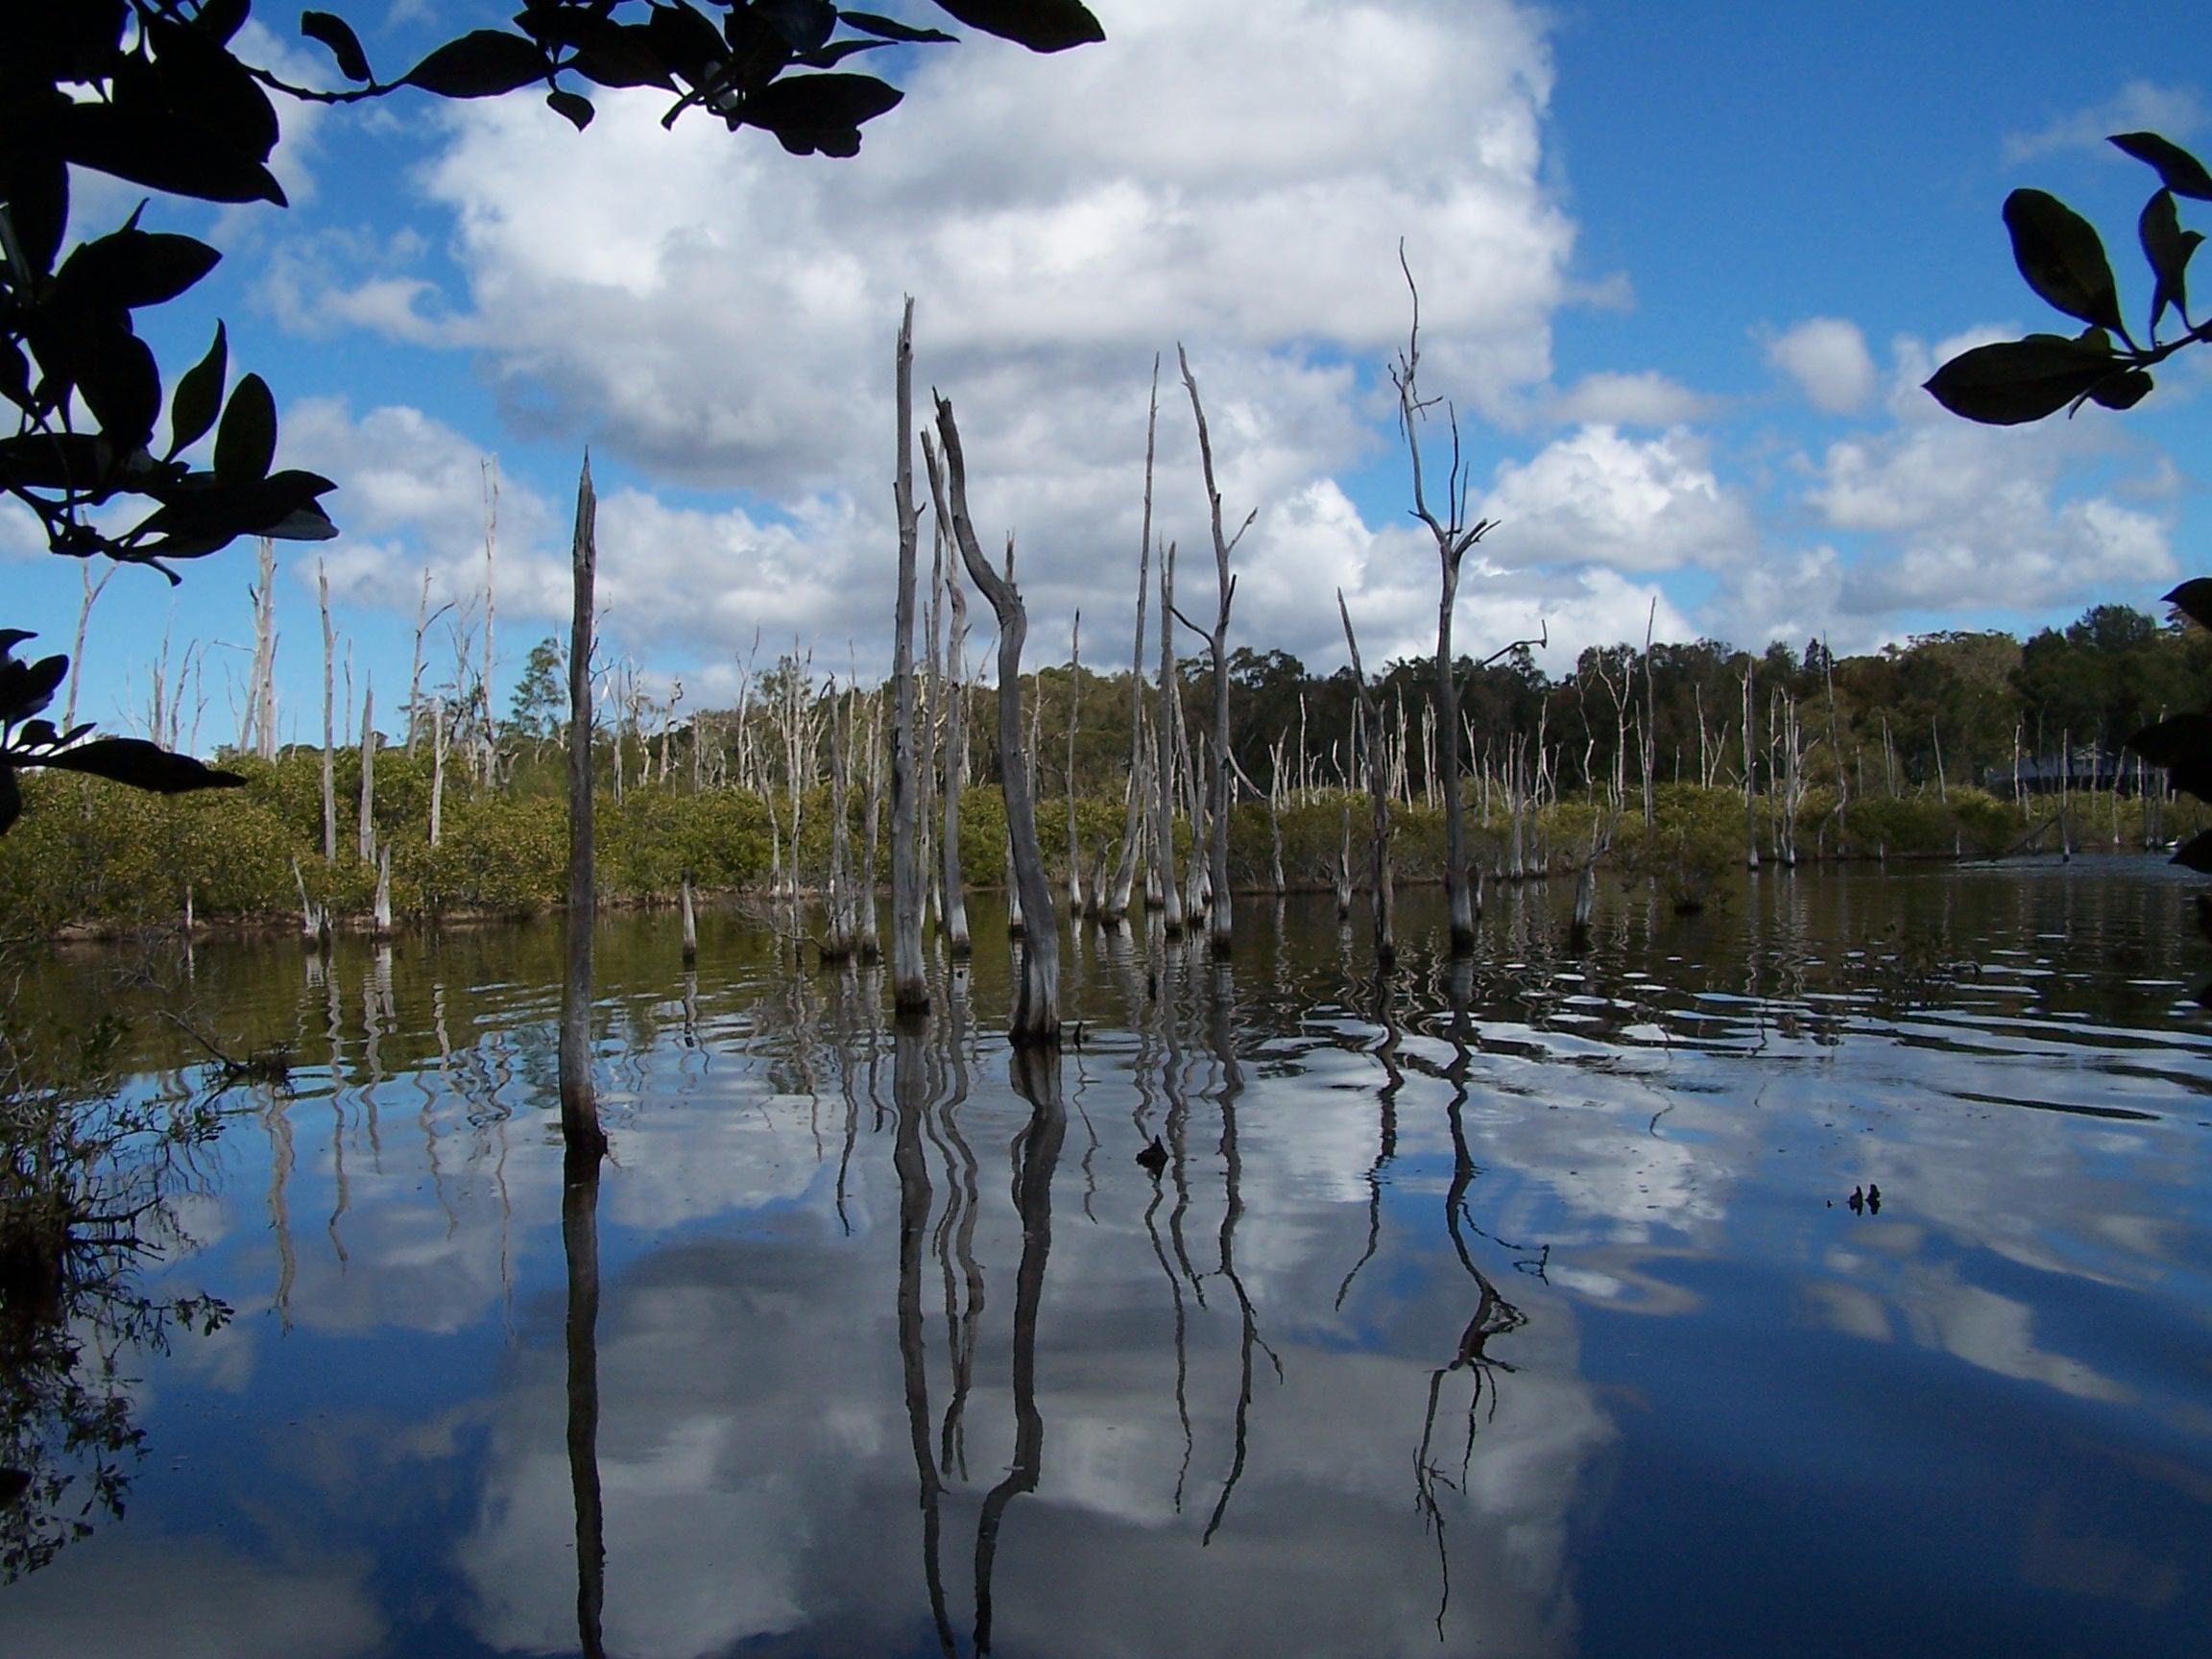 Mangrove plants flourish on coastlines, but rising seas may eradicate them by 2050